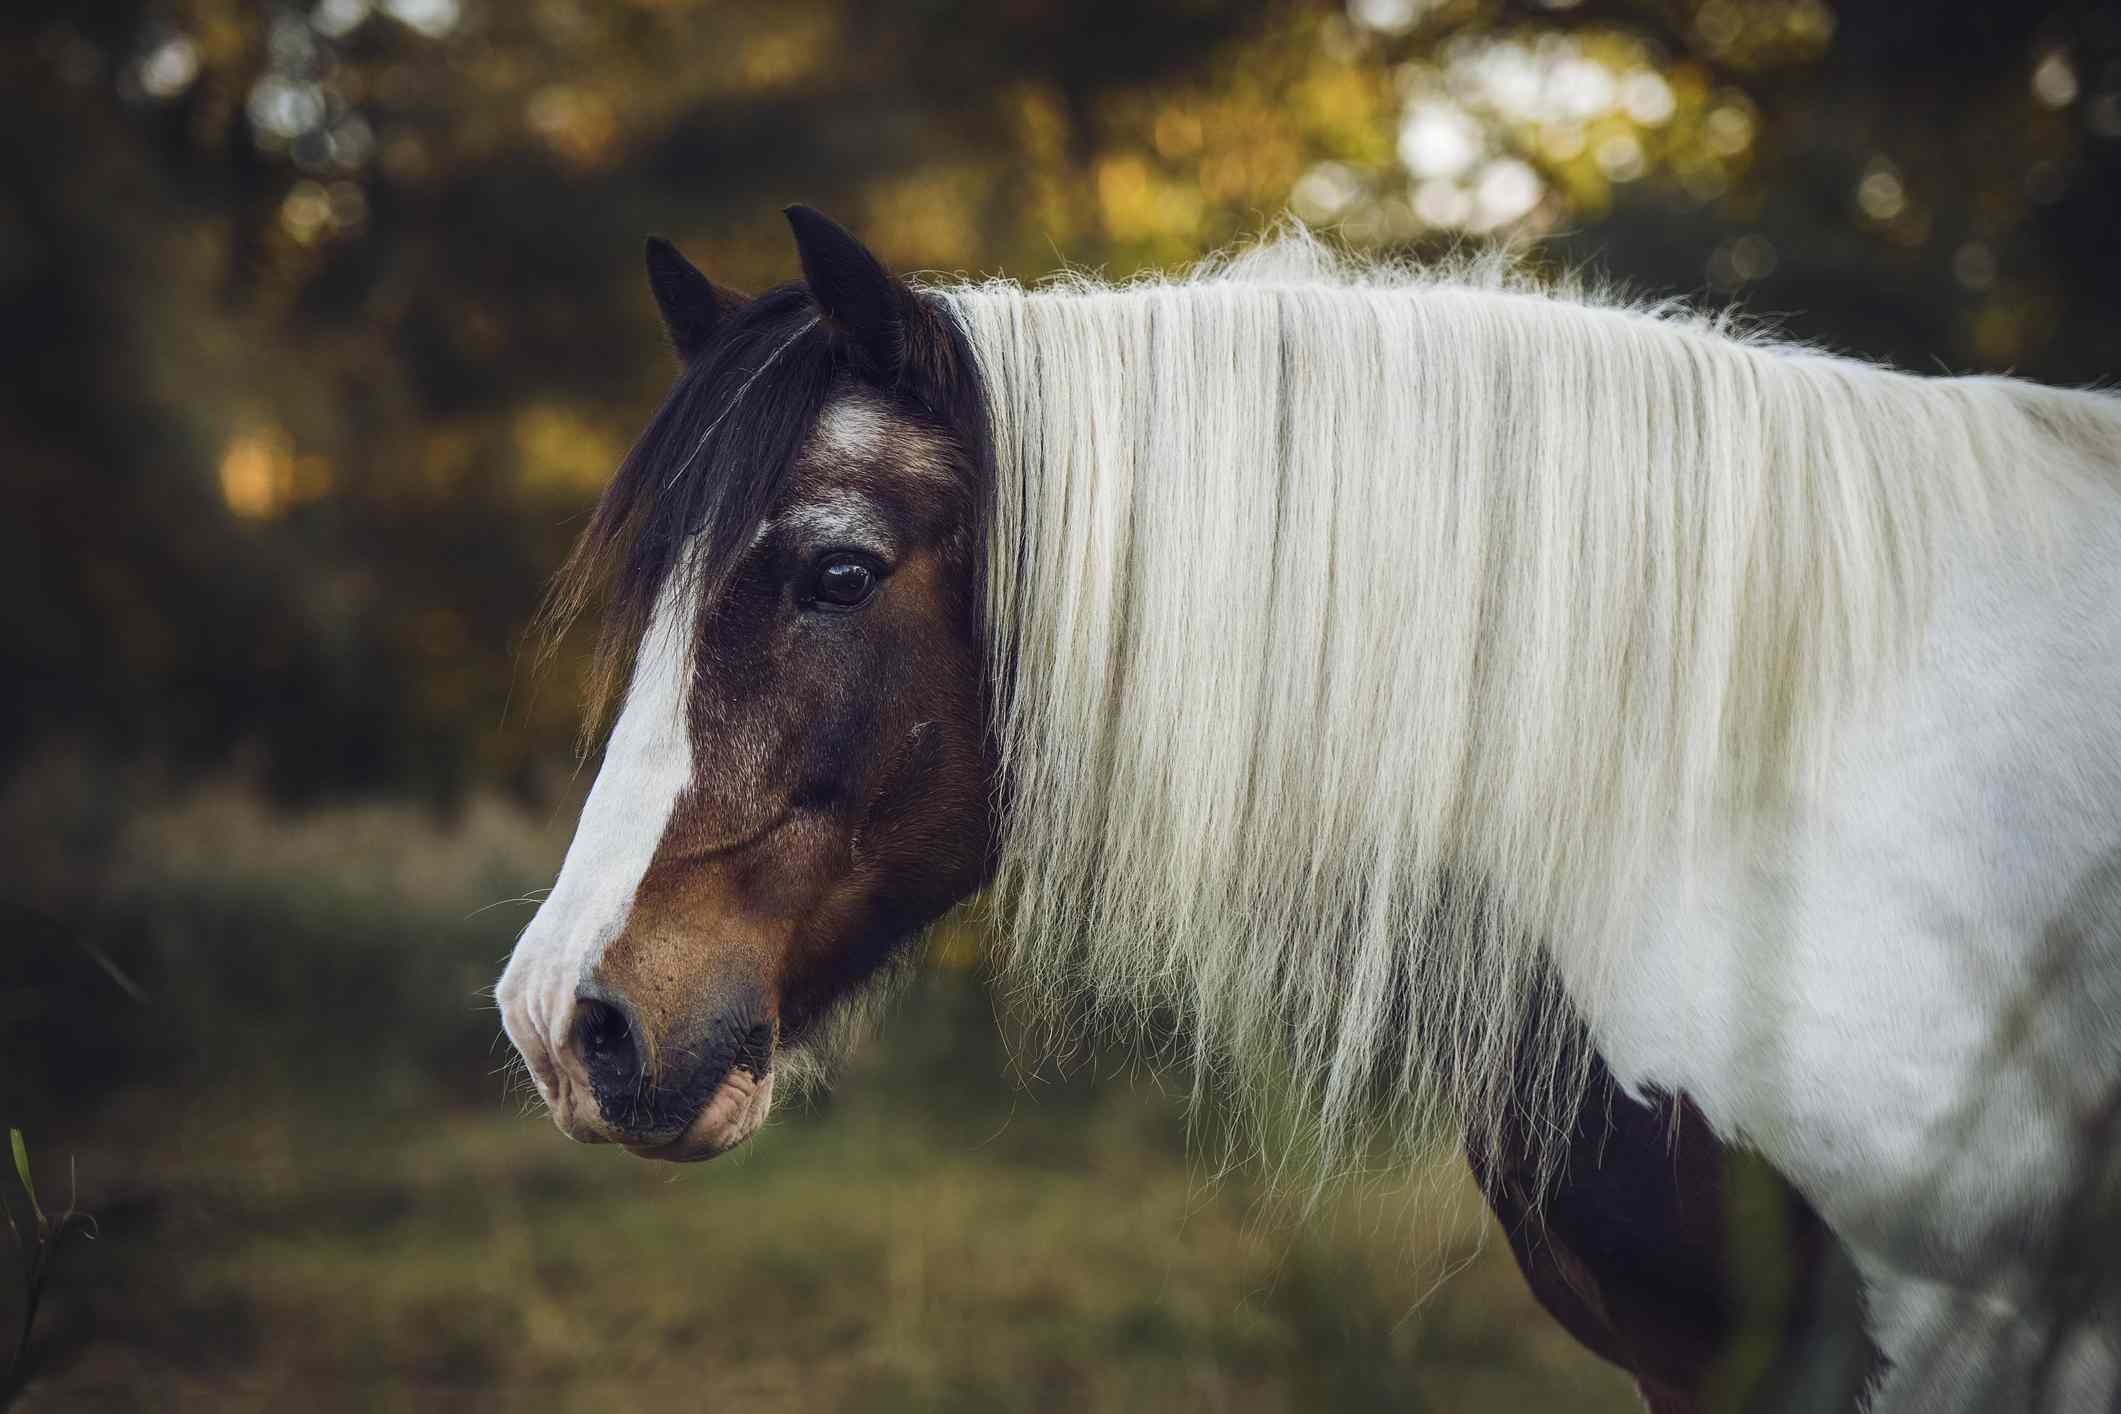 Senior Gypsy Vanner posing in a pasture.